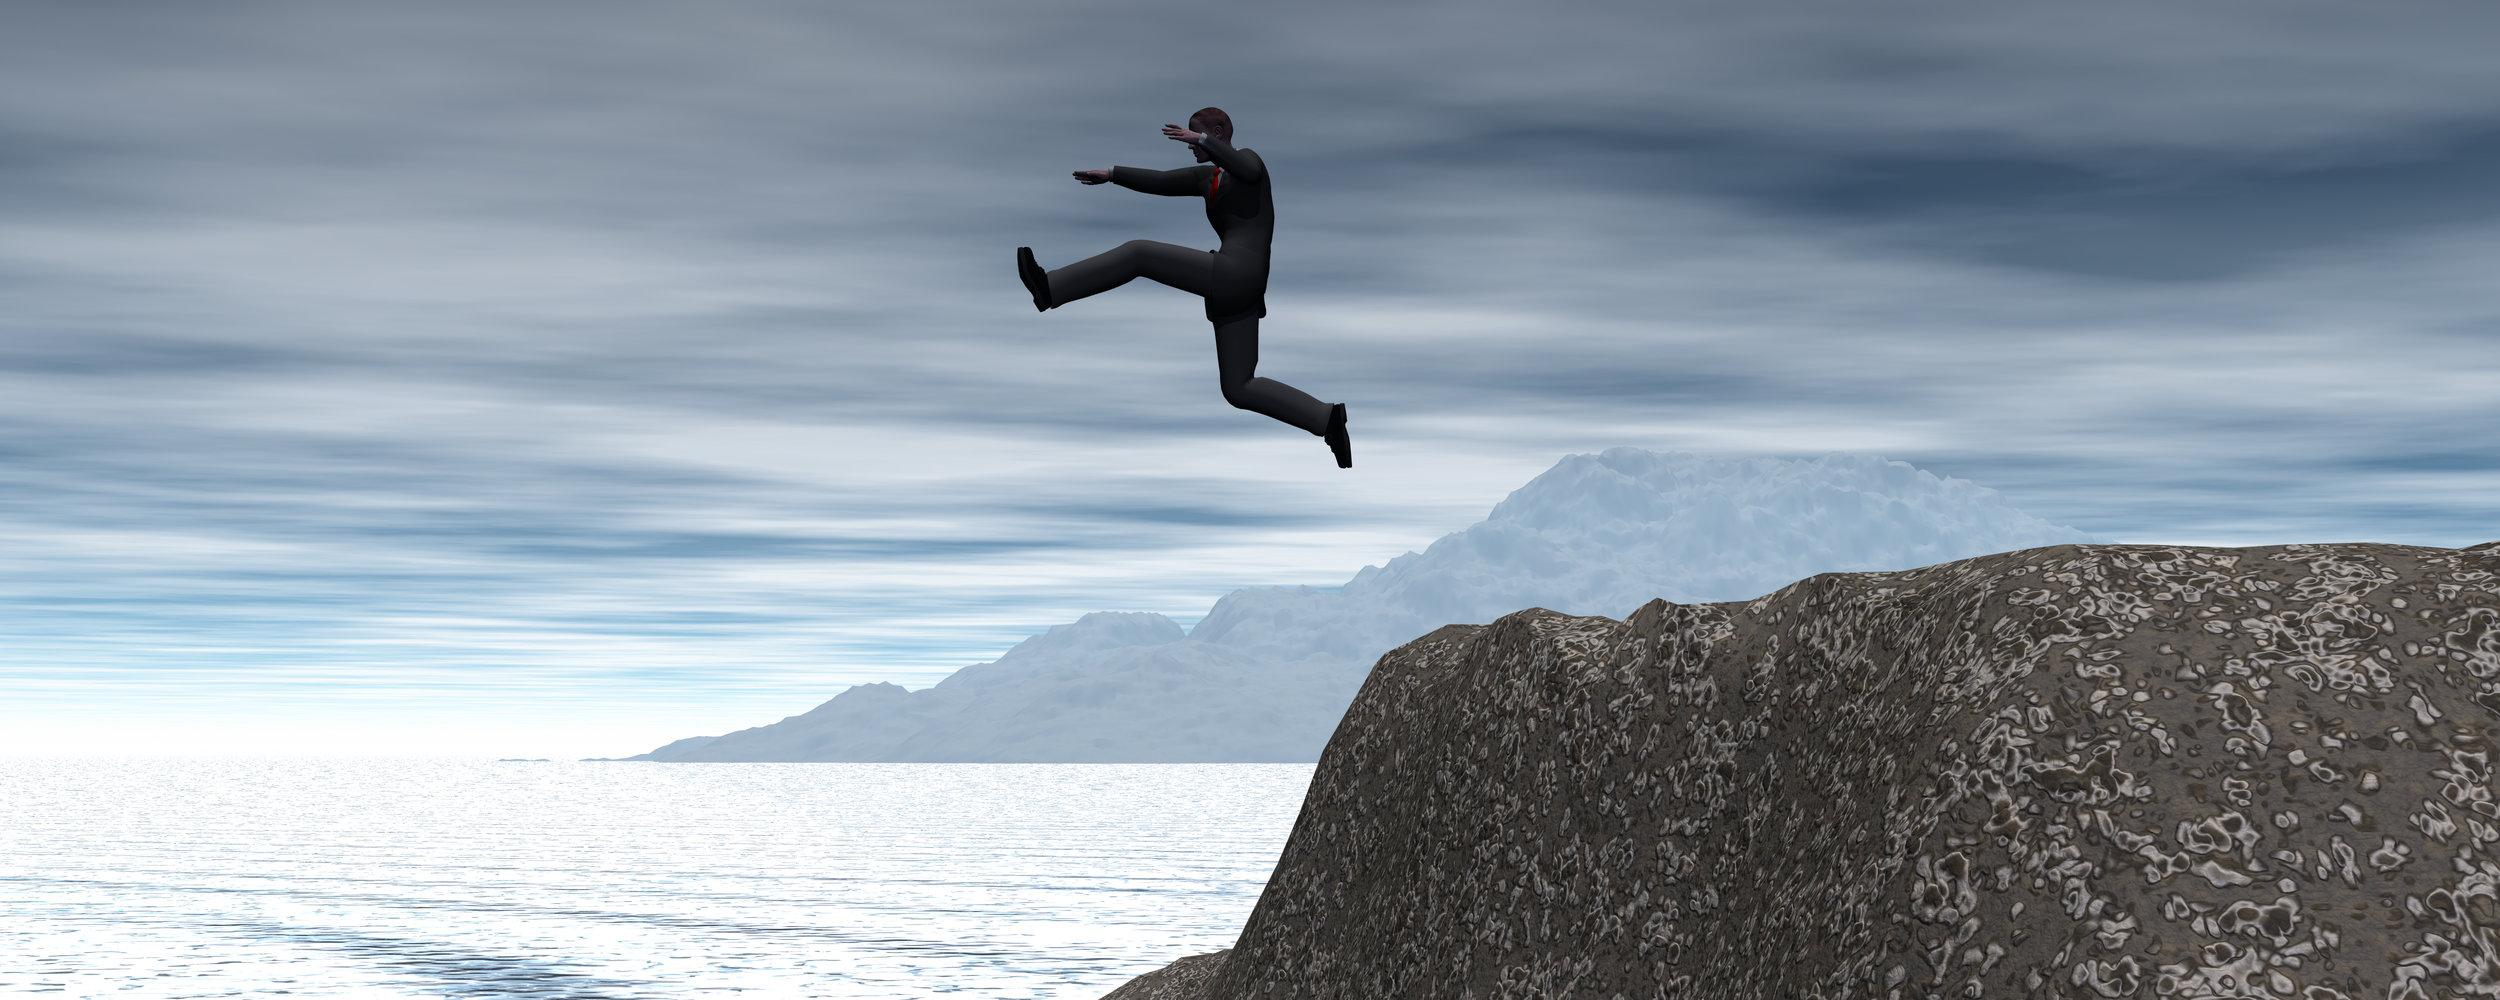 Taking the plunge.jpg